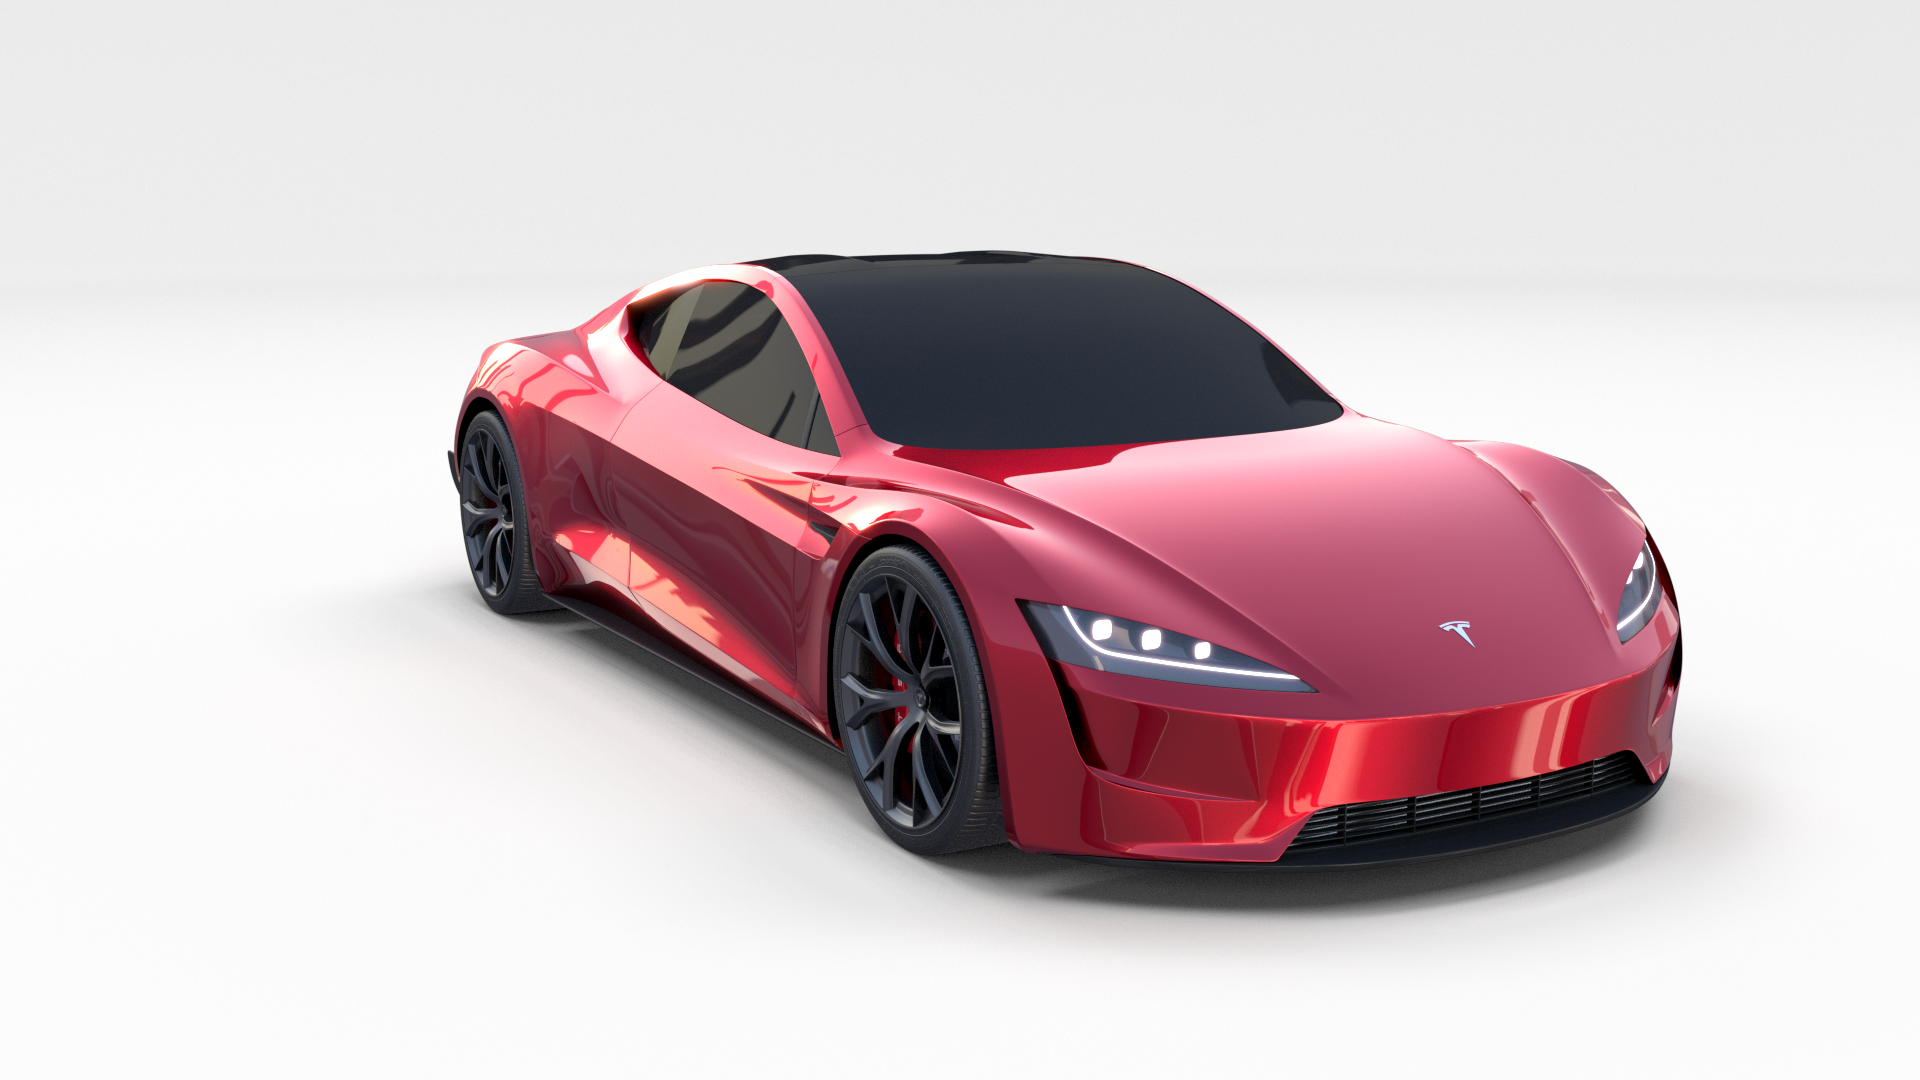 Tesla Roadster 2020 Tesla Roadster Tesla Roadster Tesla Roadsters